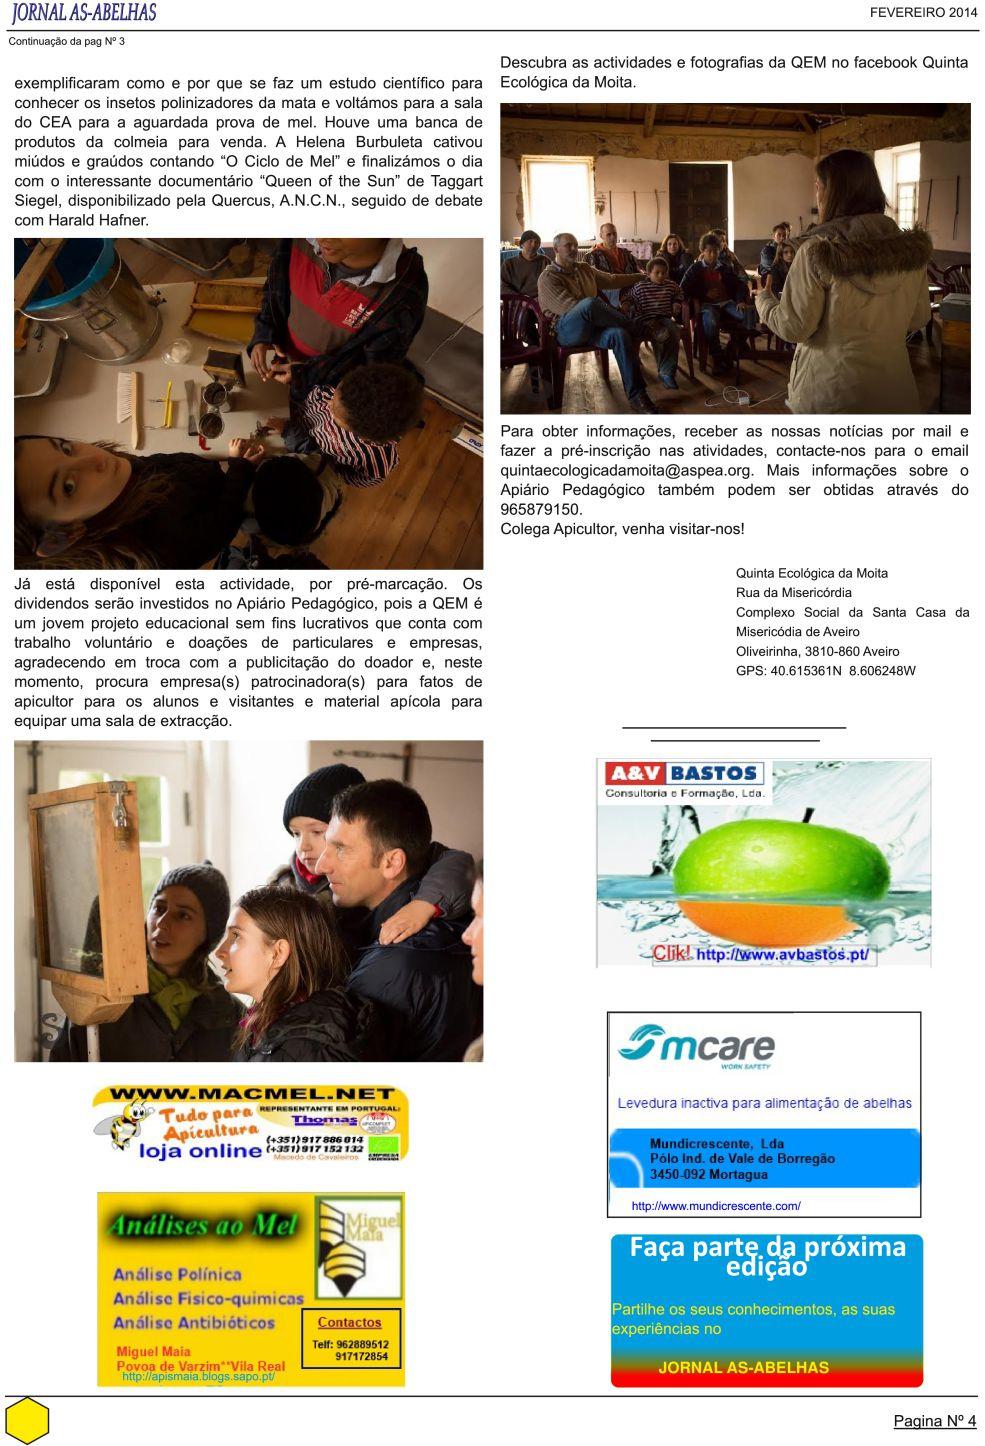 2014-02-28_Jornal As Abelhas_QEM_Mar2014_pag4